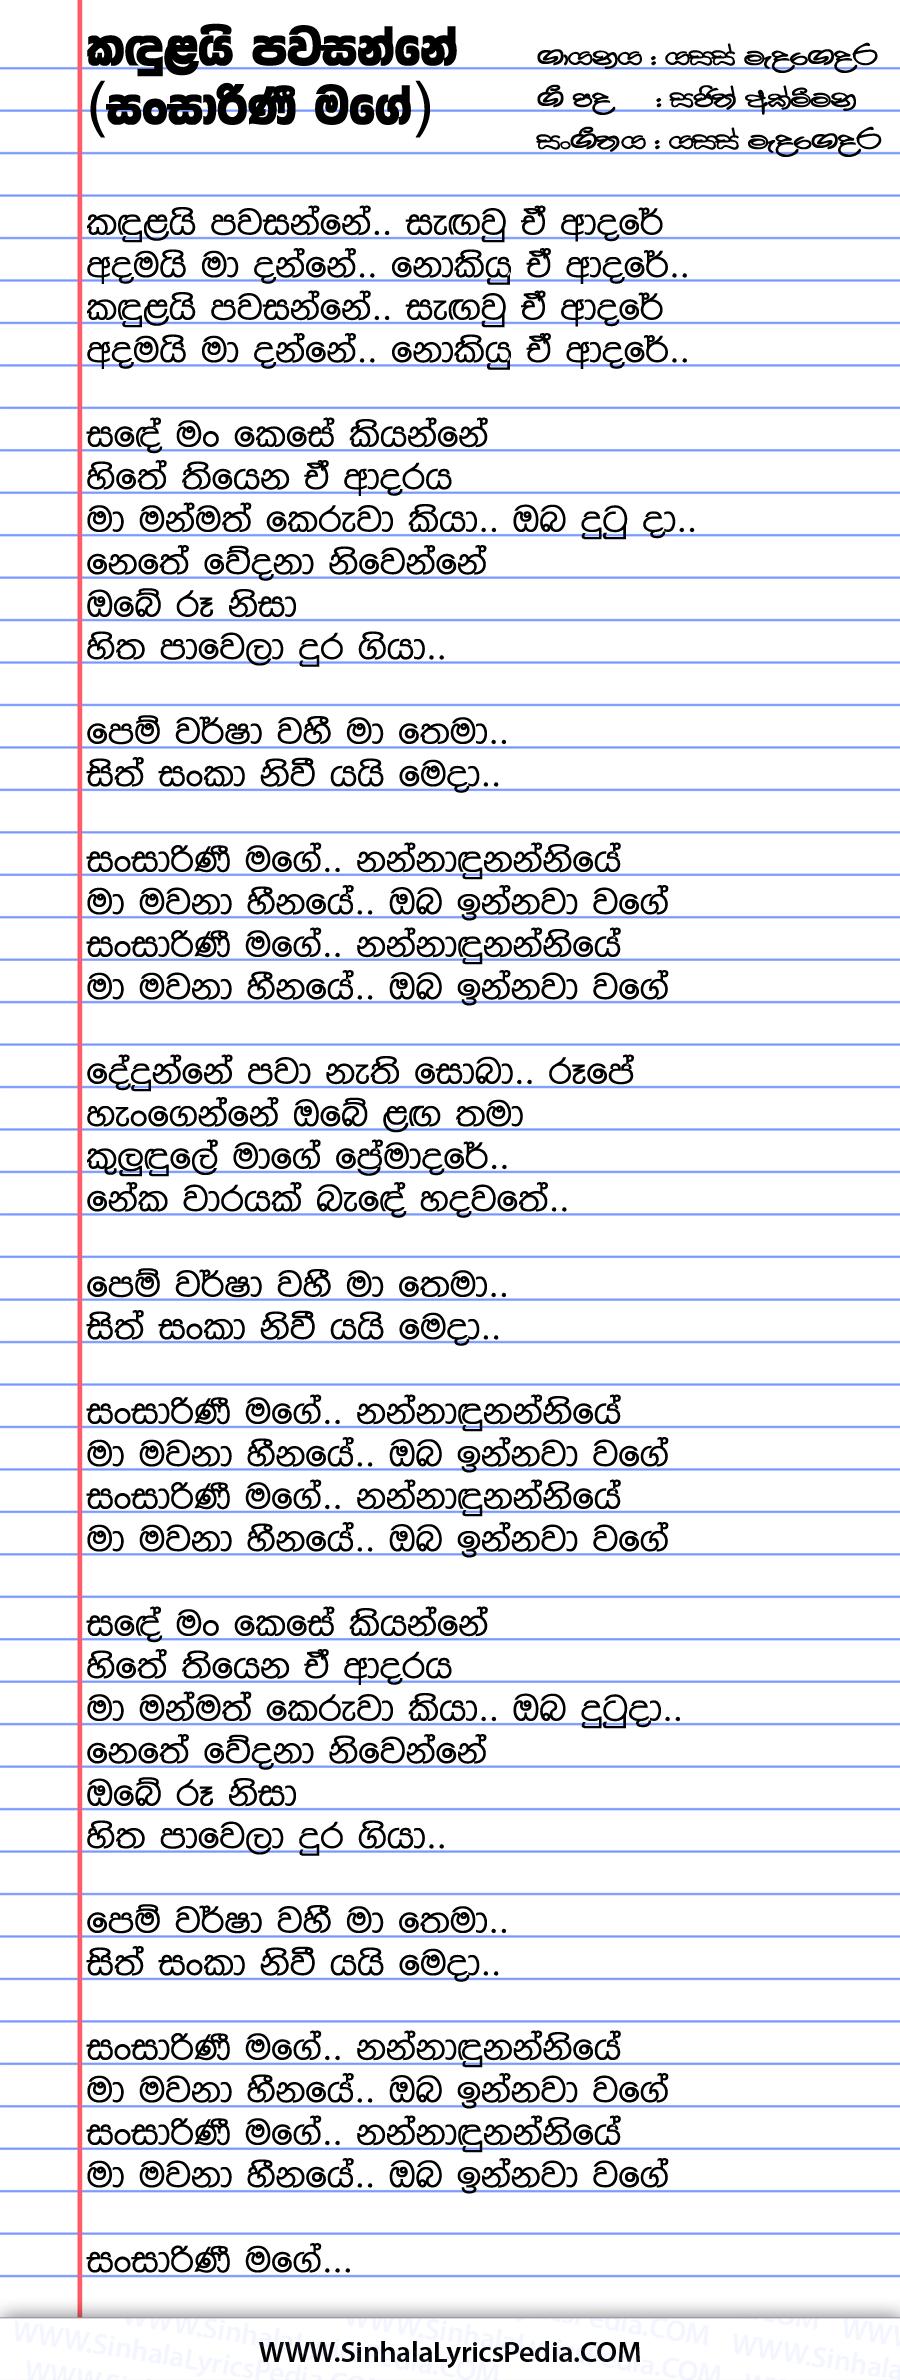 Kandulai Pawasanne (Sansarini Mage) Song Lyrics